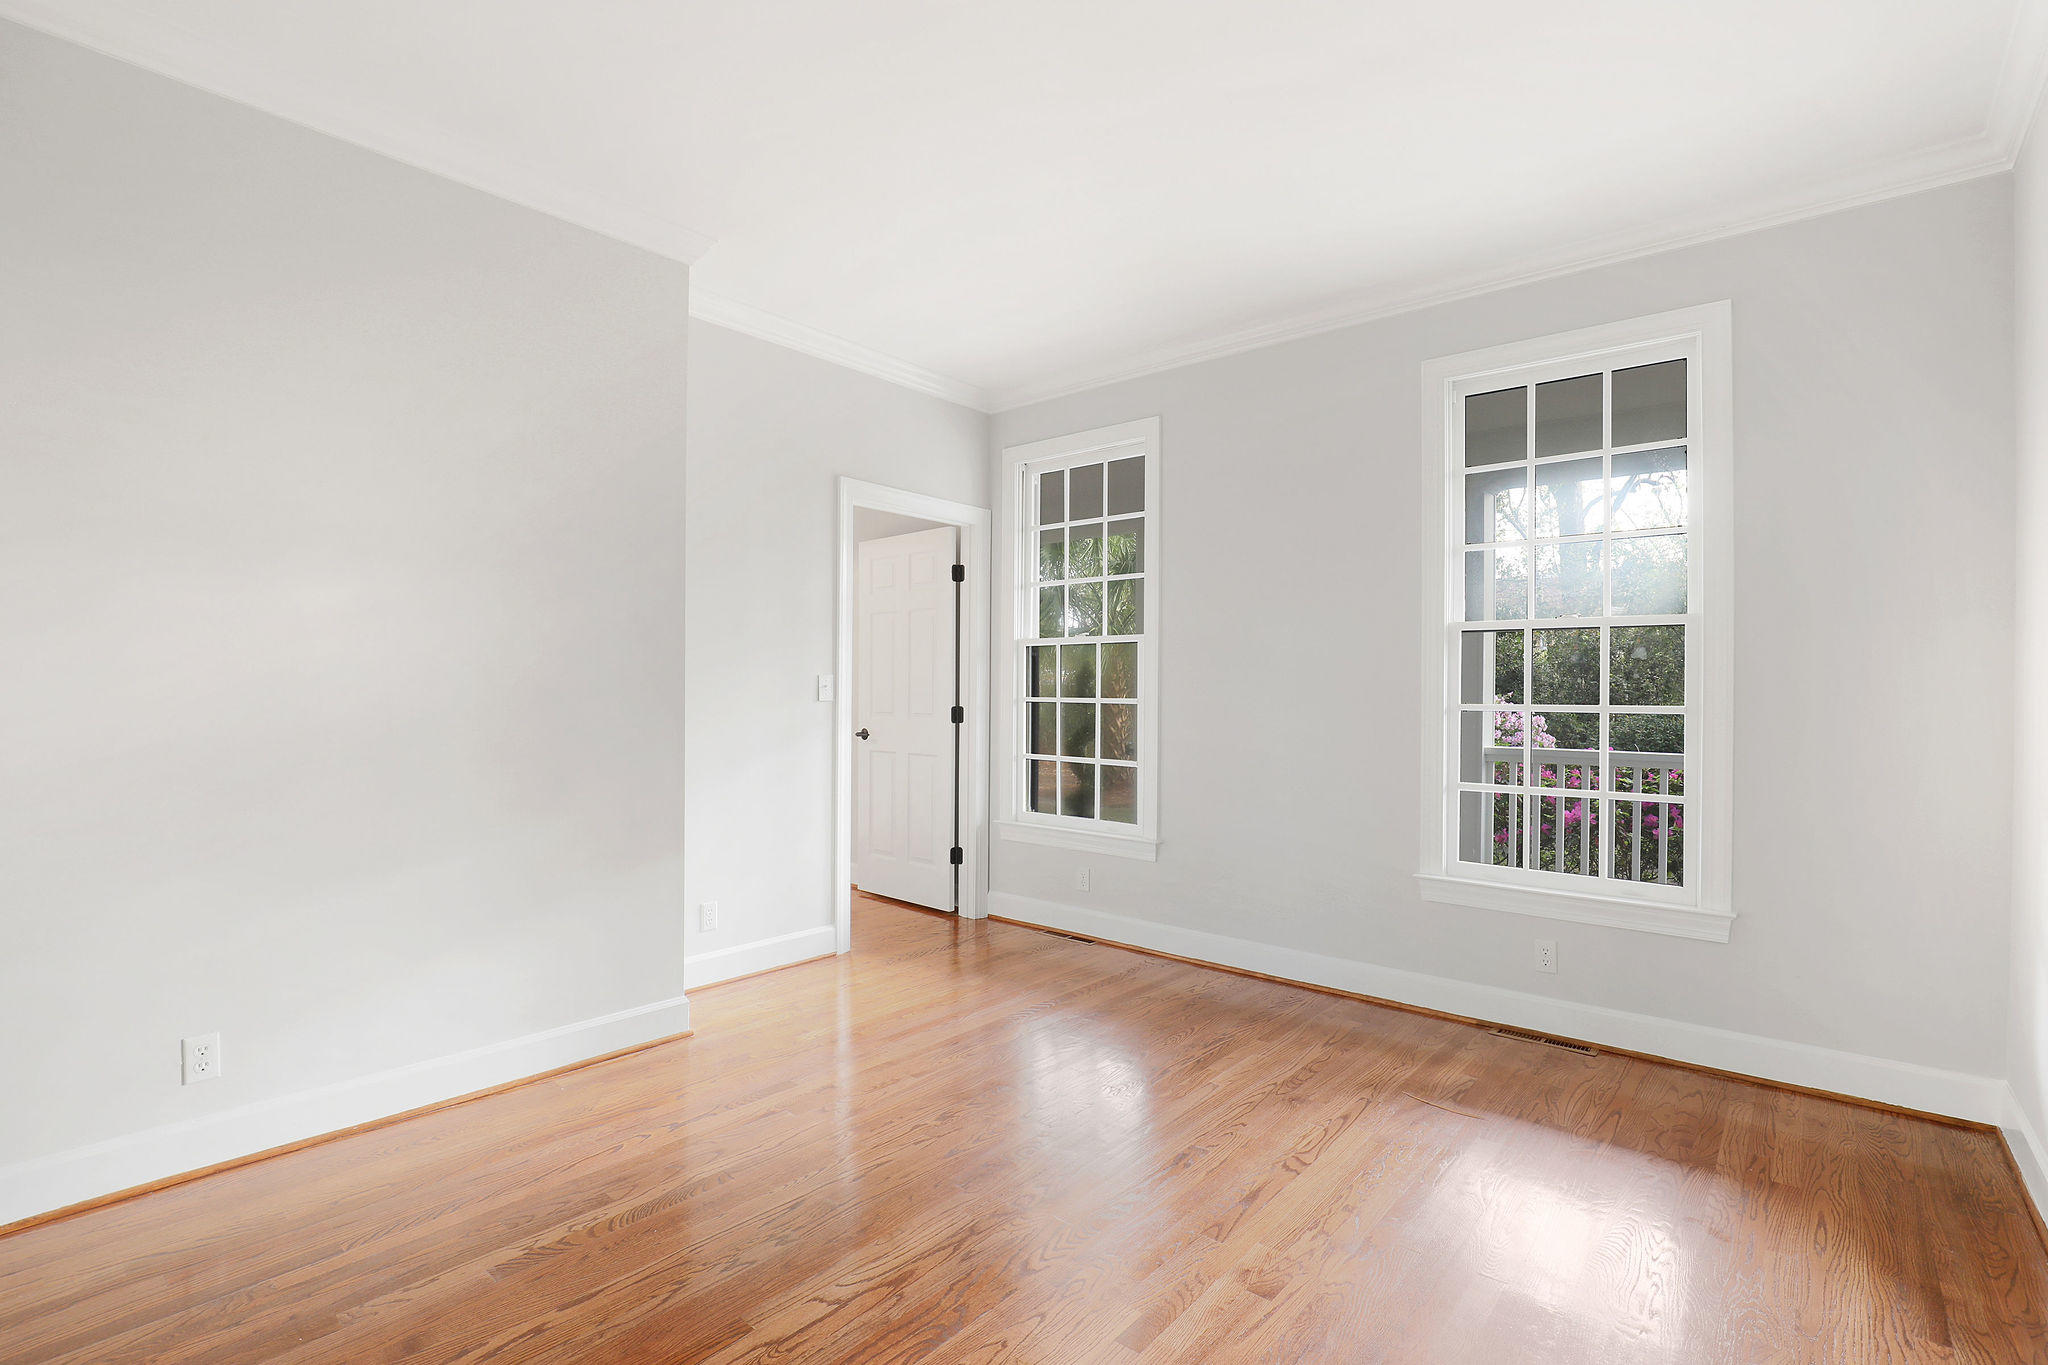 Old Mt Pleasant Homes For Sale - 1417 Edwards, Mount Pleasant, SC - 21